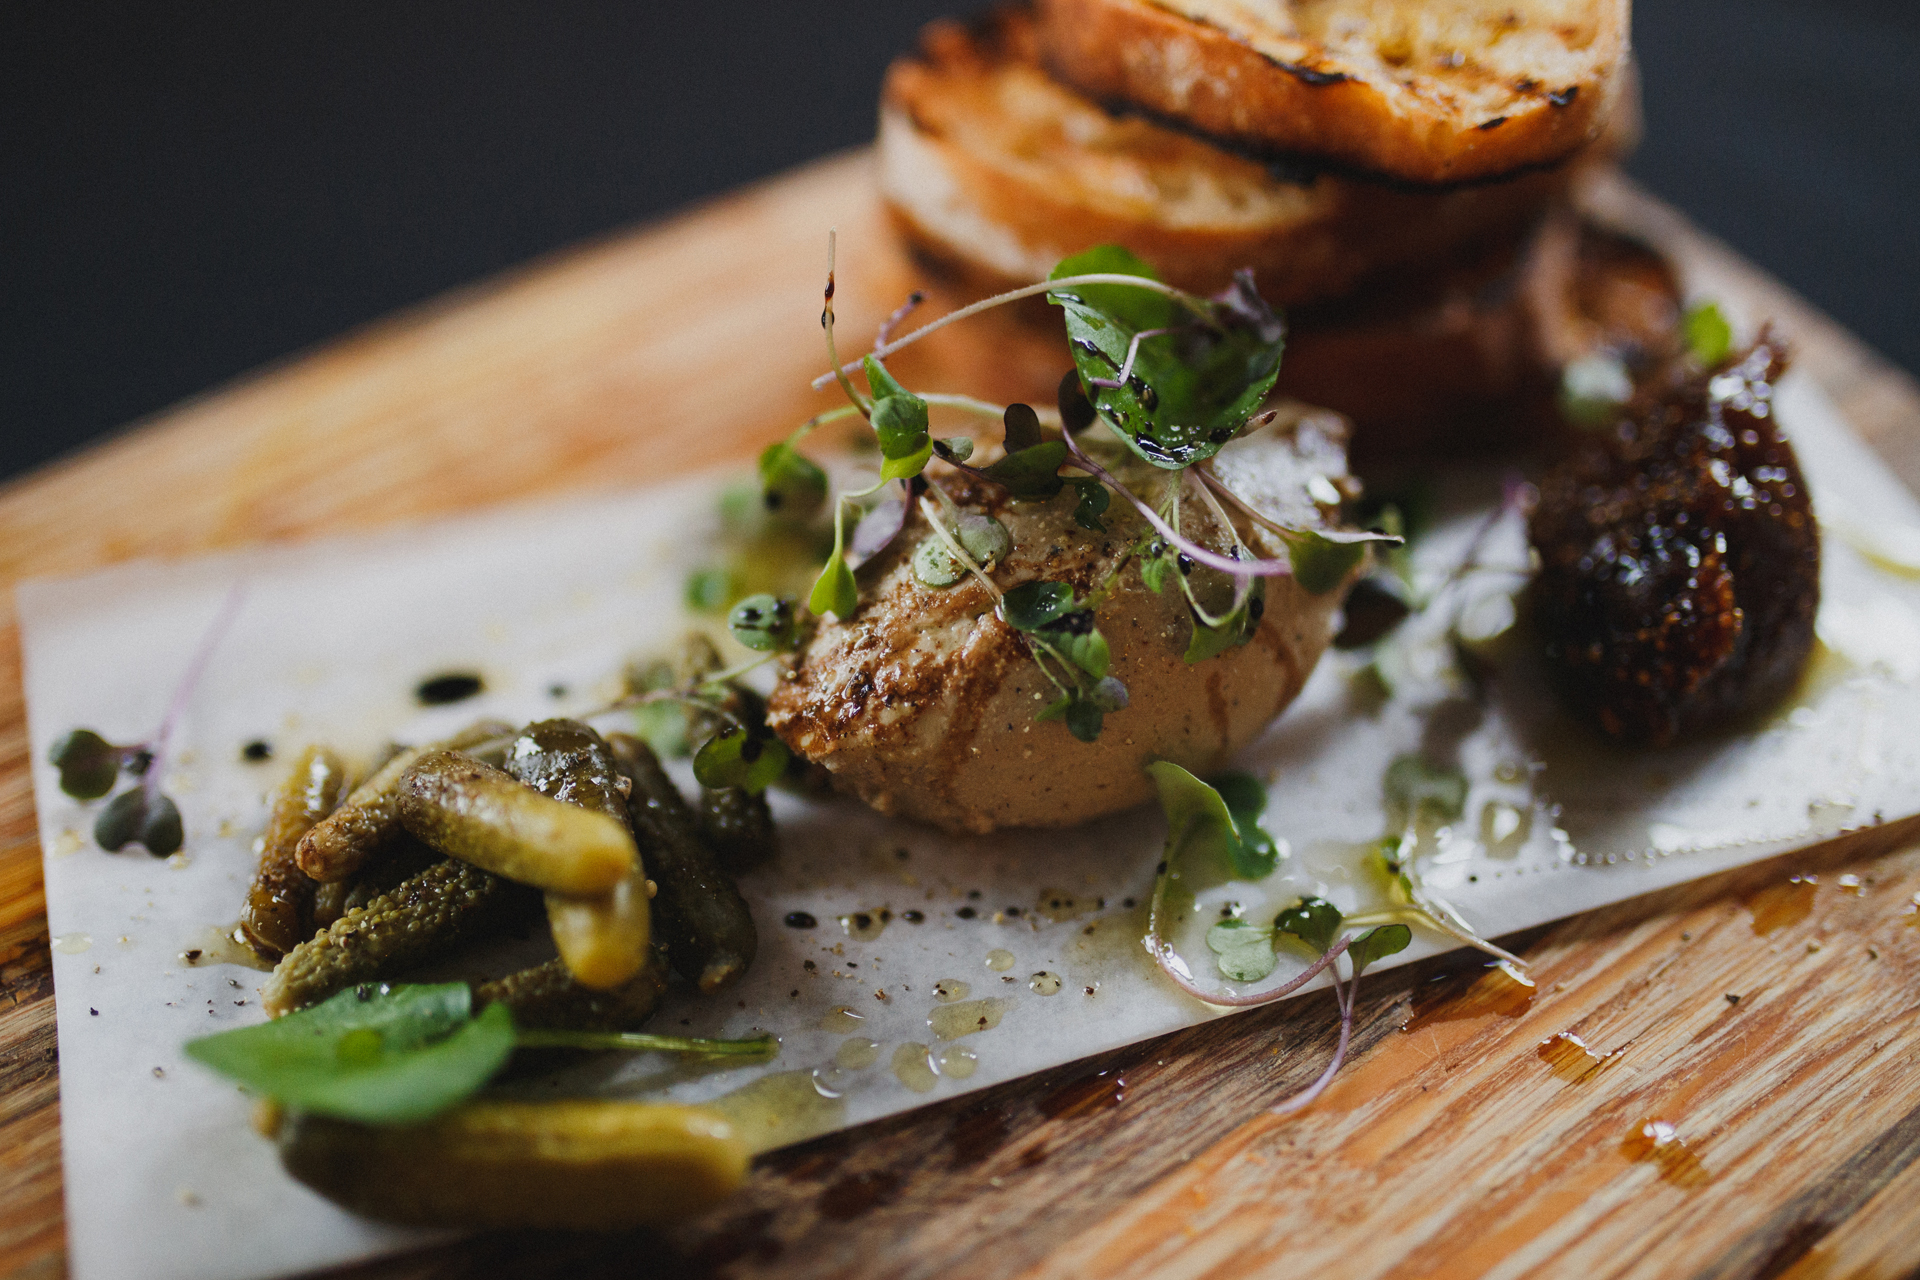 Tauranga_Bar_Fitout_Brooklyn_Food_Photography_14_web.jpg